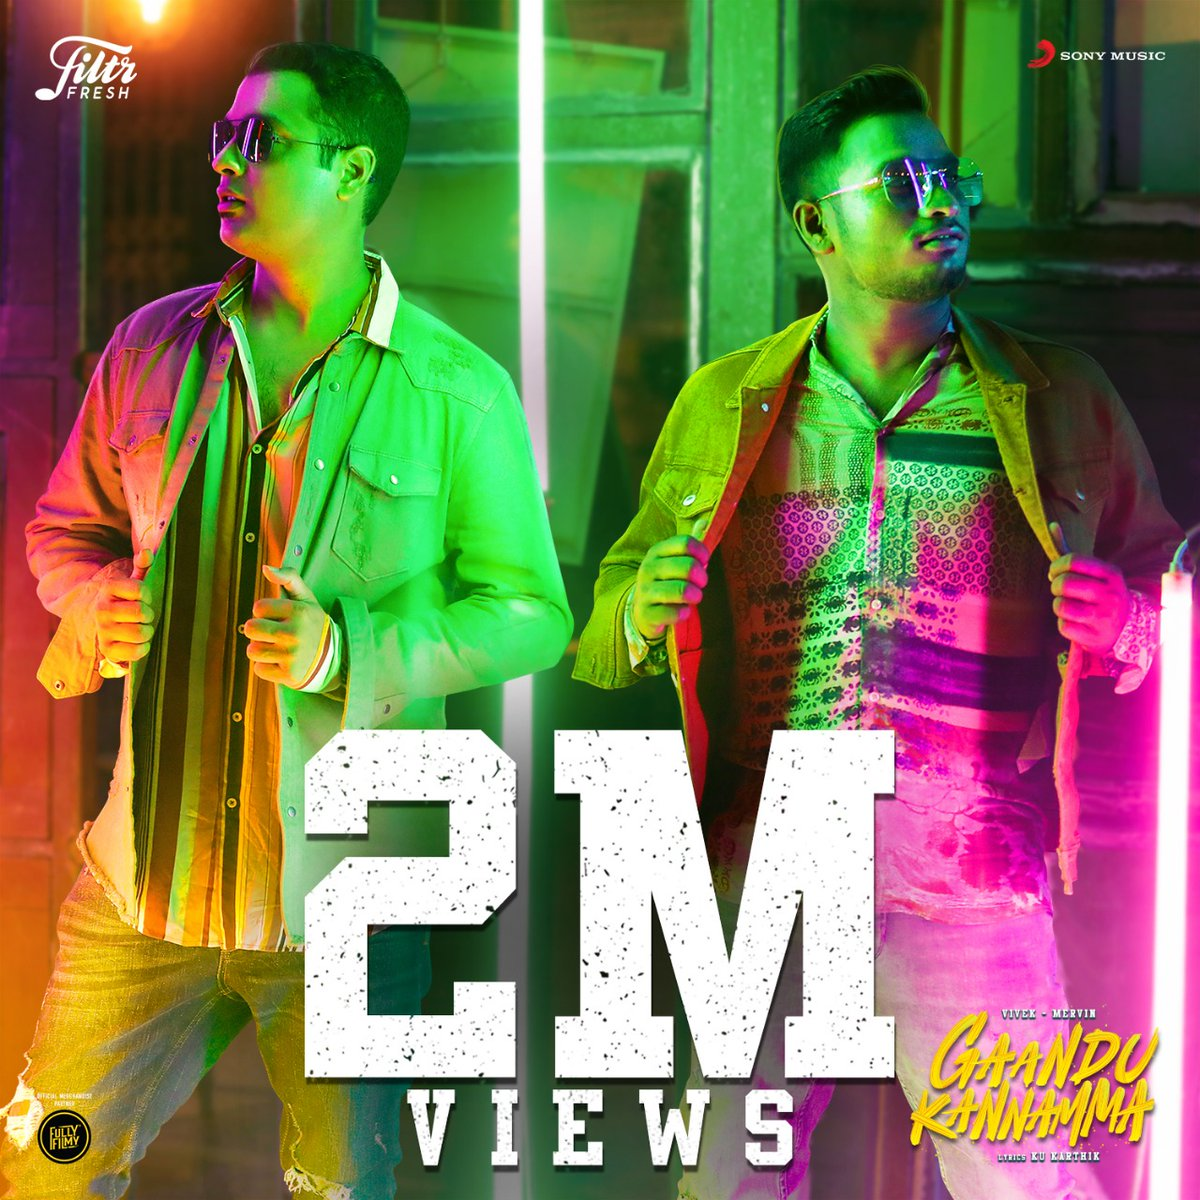 The quirky single #GaanduKannamma hits 2 Million Views ❤️  @iamviveksiva - @MervinJSolomon Duo 🎵🎼  ICYMI ▶   @KuKarthk @SonyMusicSouth @amithkrishnan85 @PawanAlex @JafferJiky @balaji_u @FullyFilmy_in